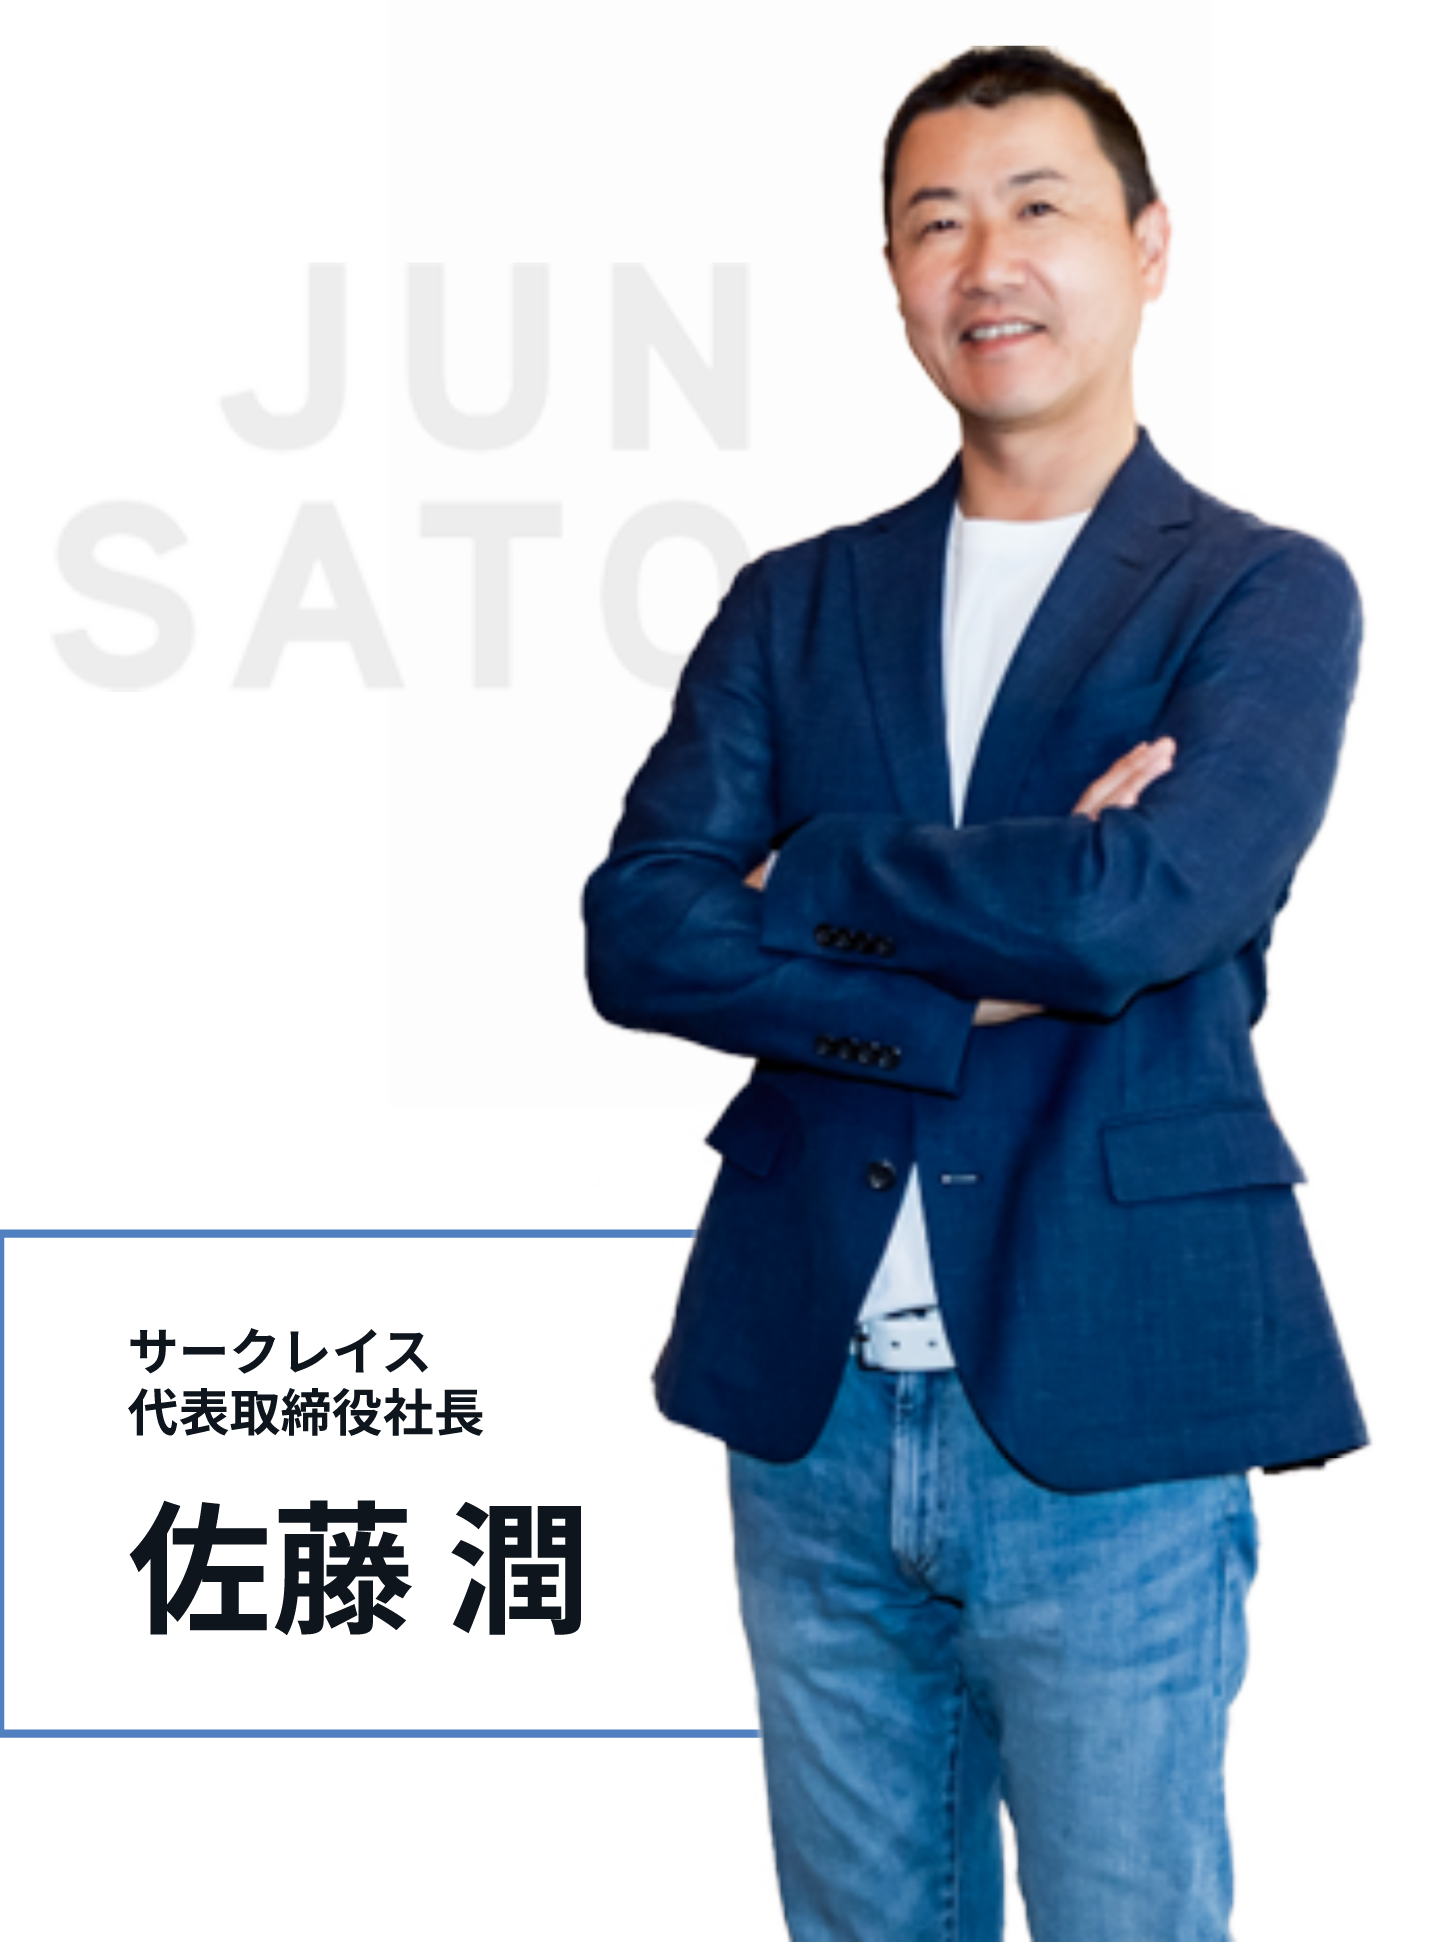 junsato_sp